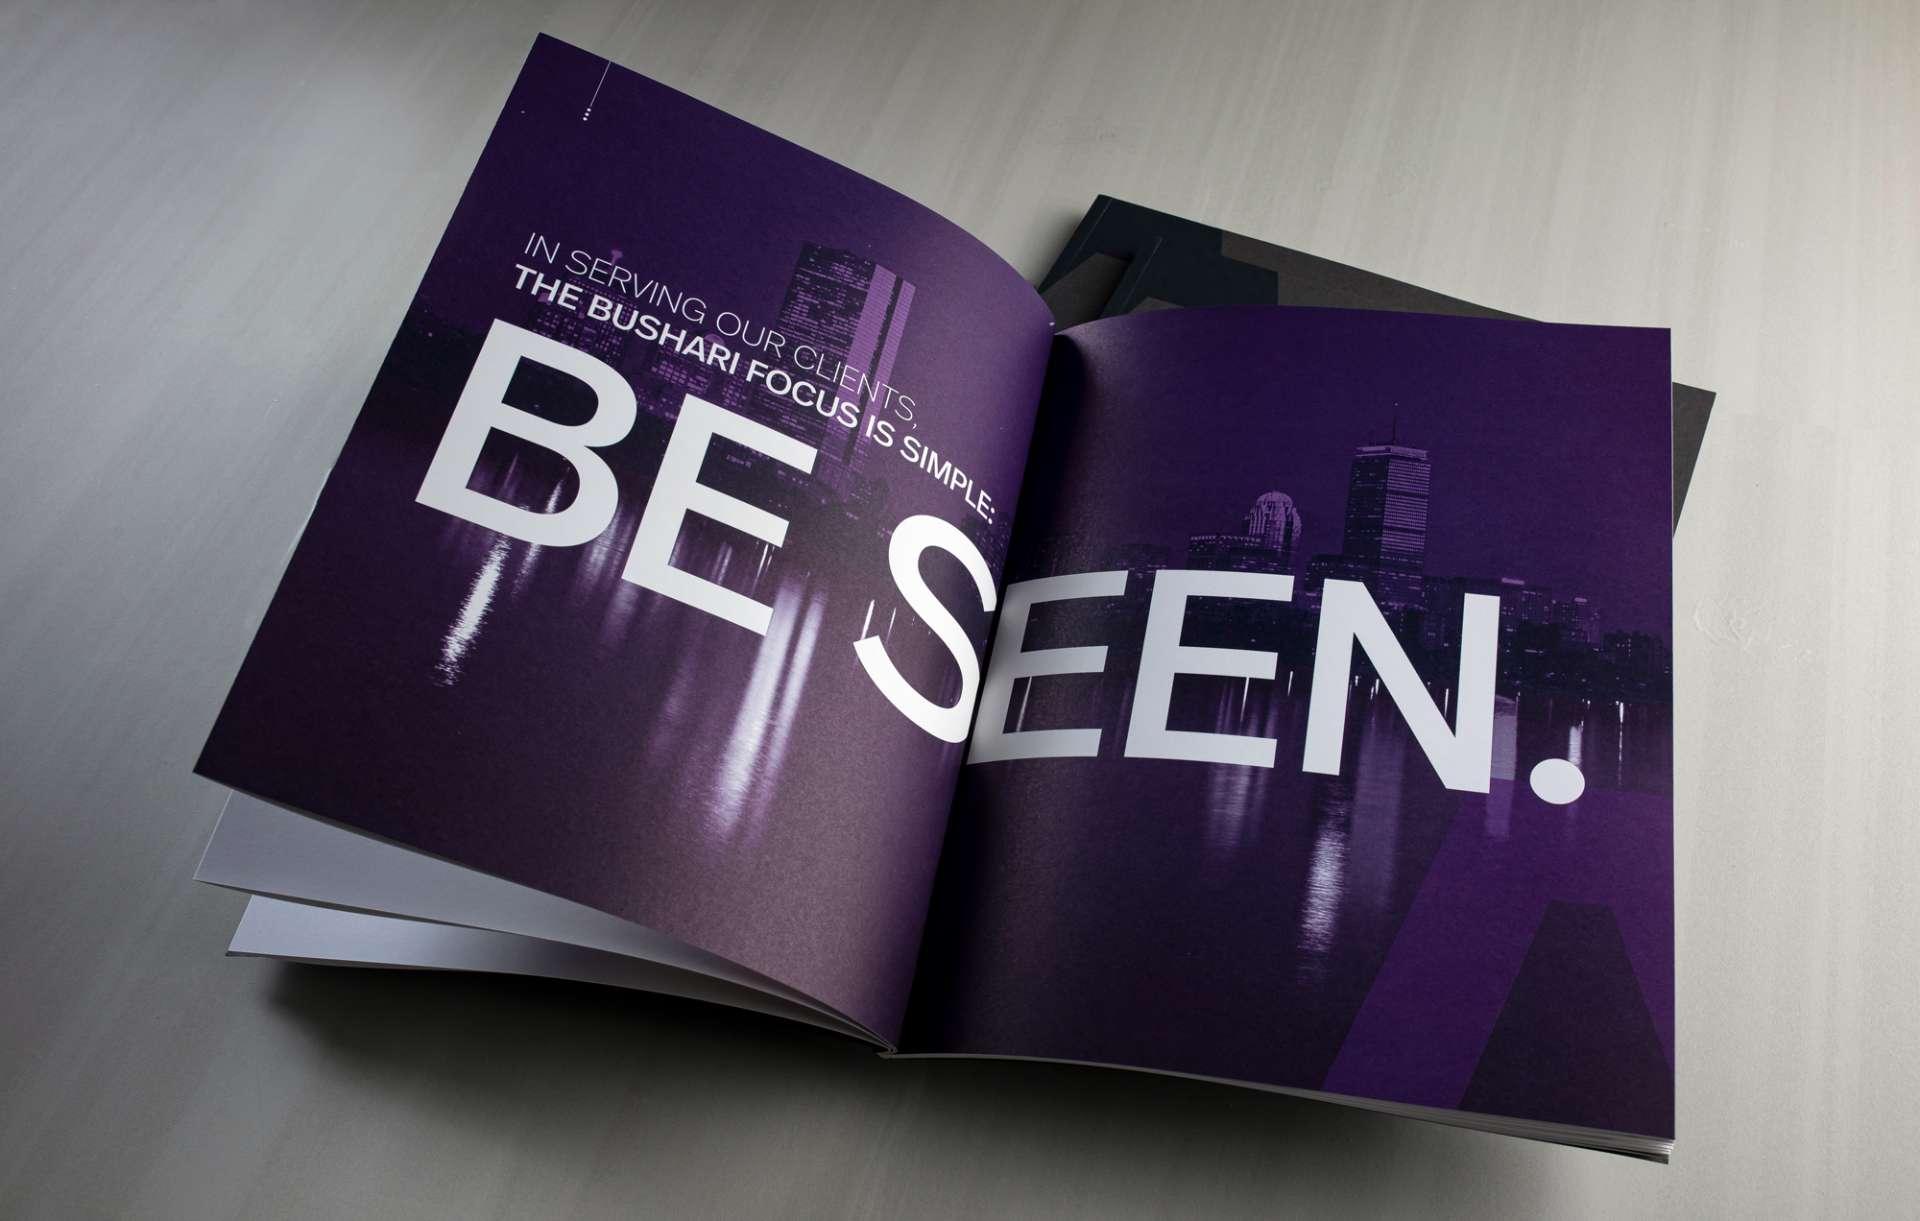 Collateral kit print marketing design for real estate brand Bushari